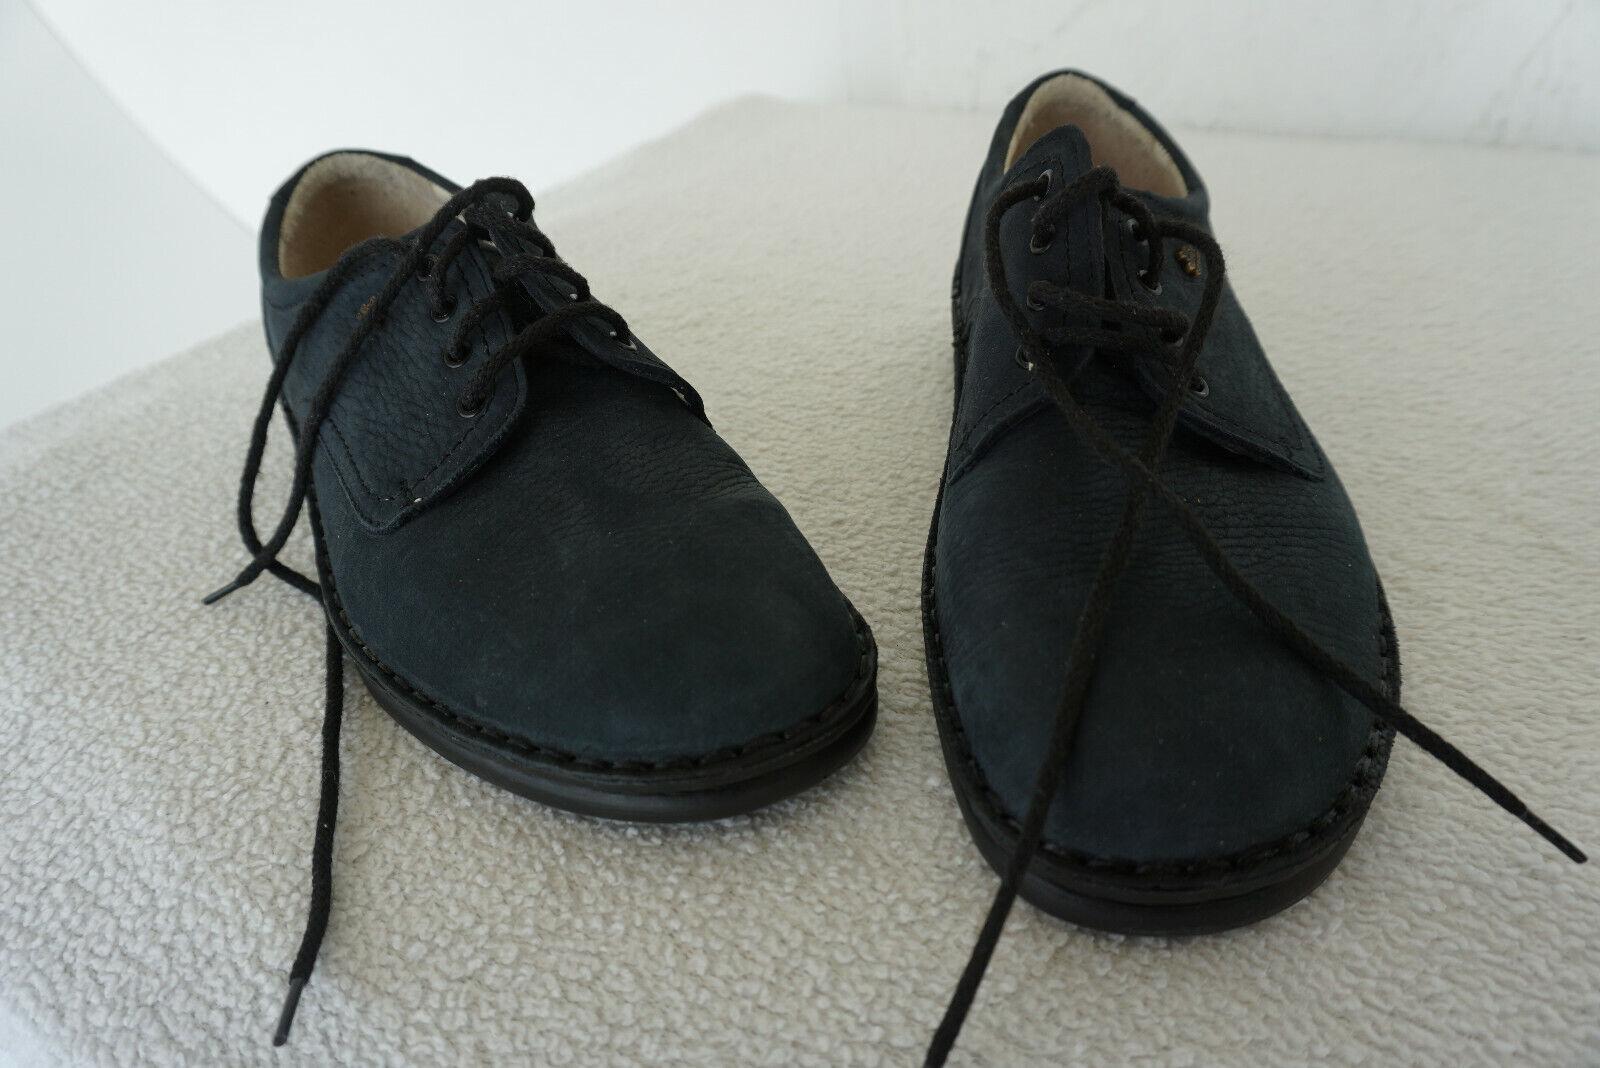 Finn Comfort Colmar Chaussures Femmes à Lacets Gr.5 38 Marine Cuir Nubuck Neuf